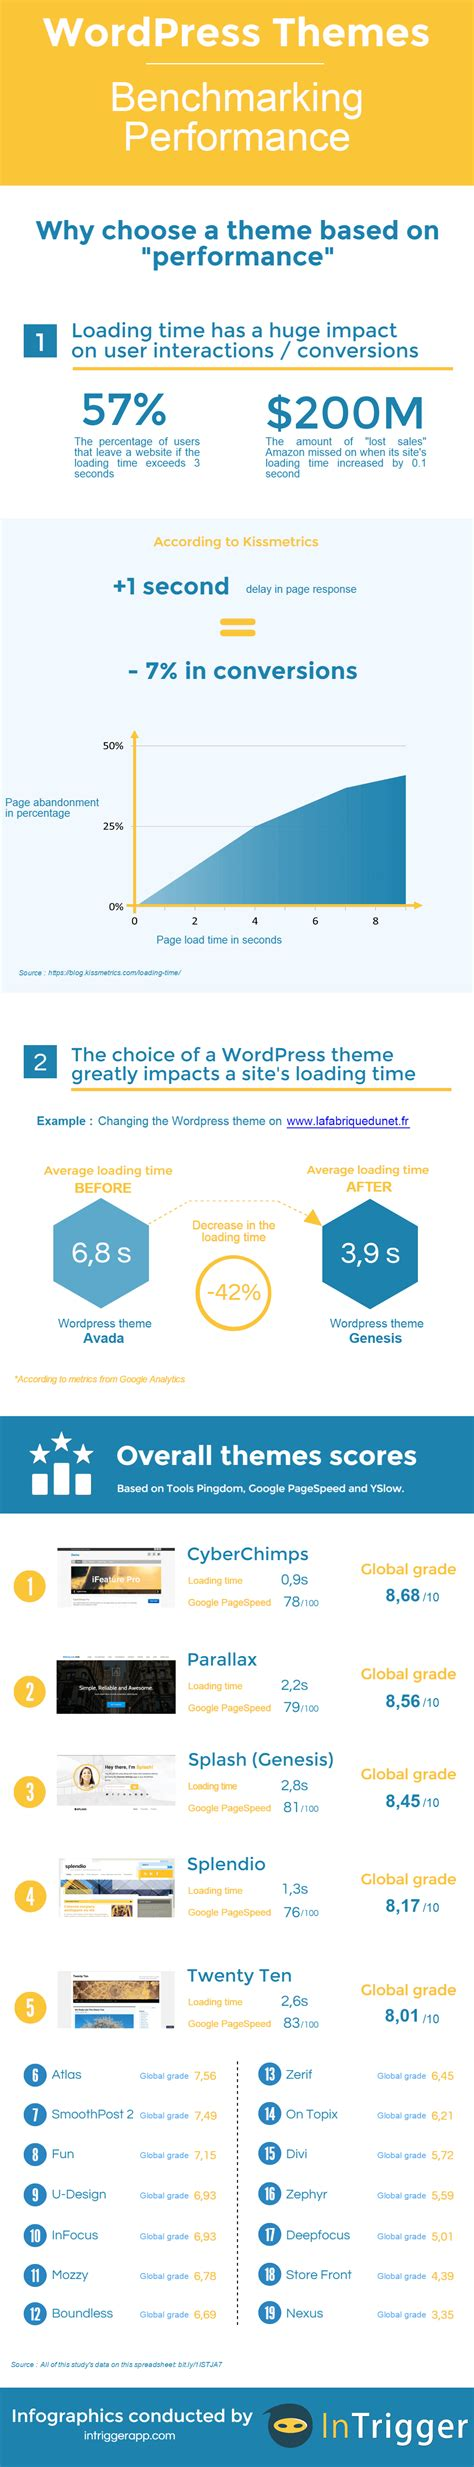 Comparison Of 20 Wordpress Themes  Performance & Average